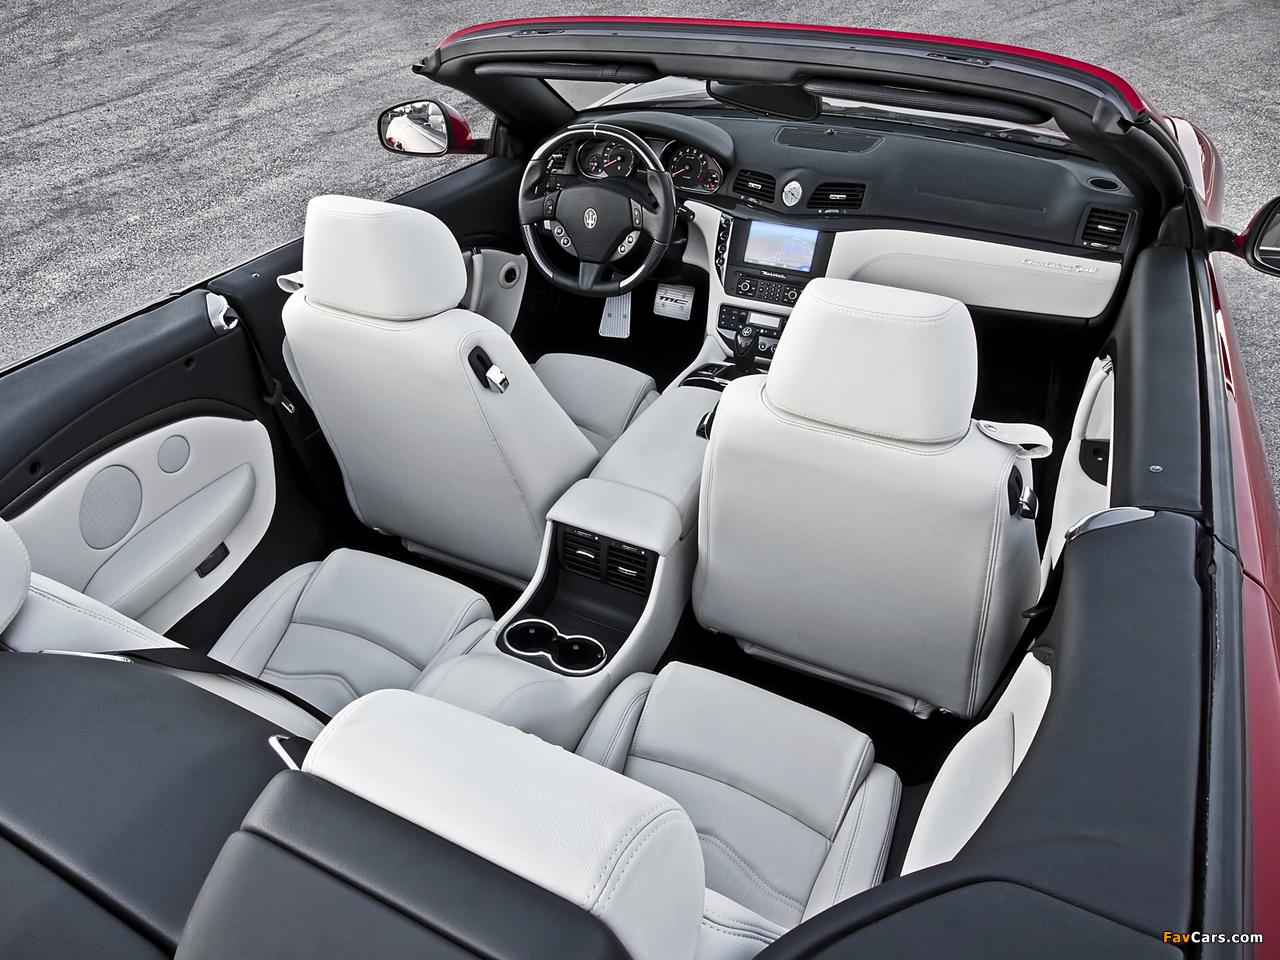 Maserati GranCabrio Sport 2012 photos (1280 x 960)